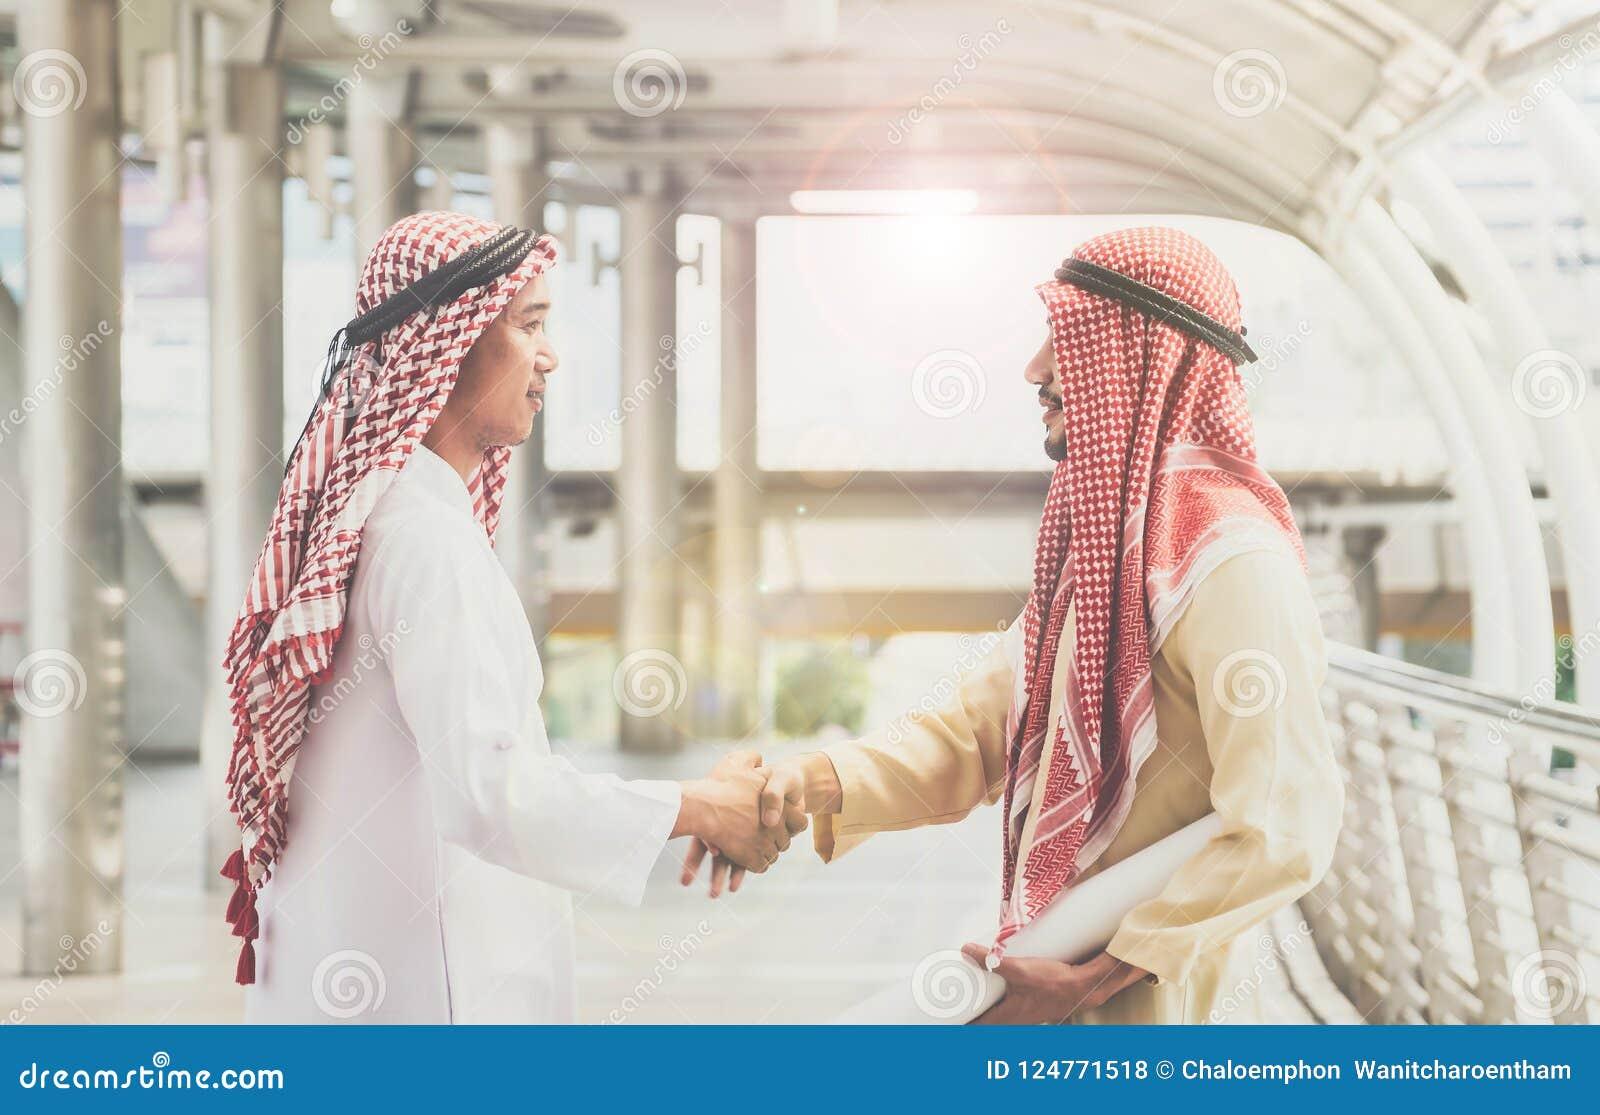 Arab businessmen shake hands and accept business deals for teamw download arab businessmen shake hands and accept business deals for teamw stock photo image of m4hsunfo